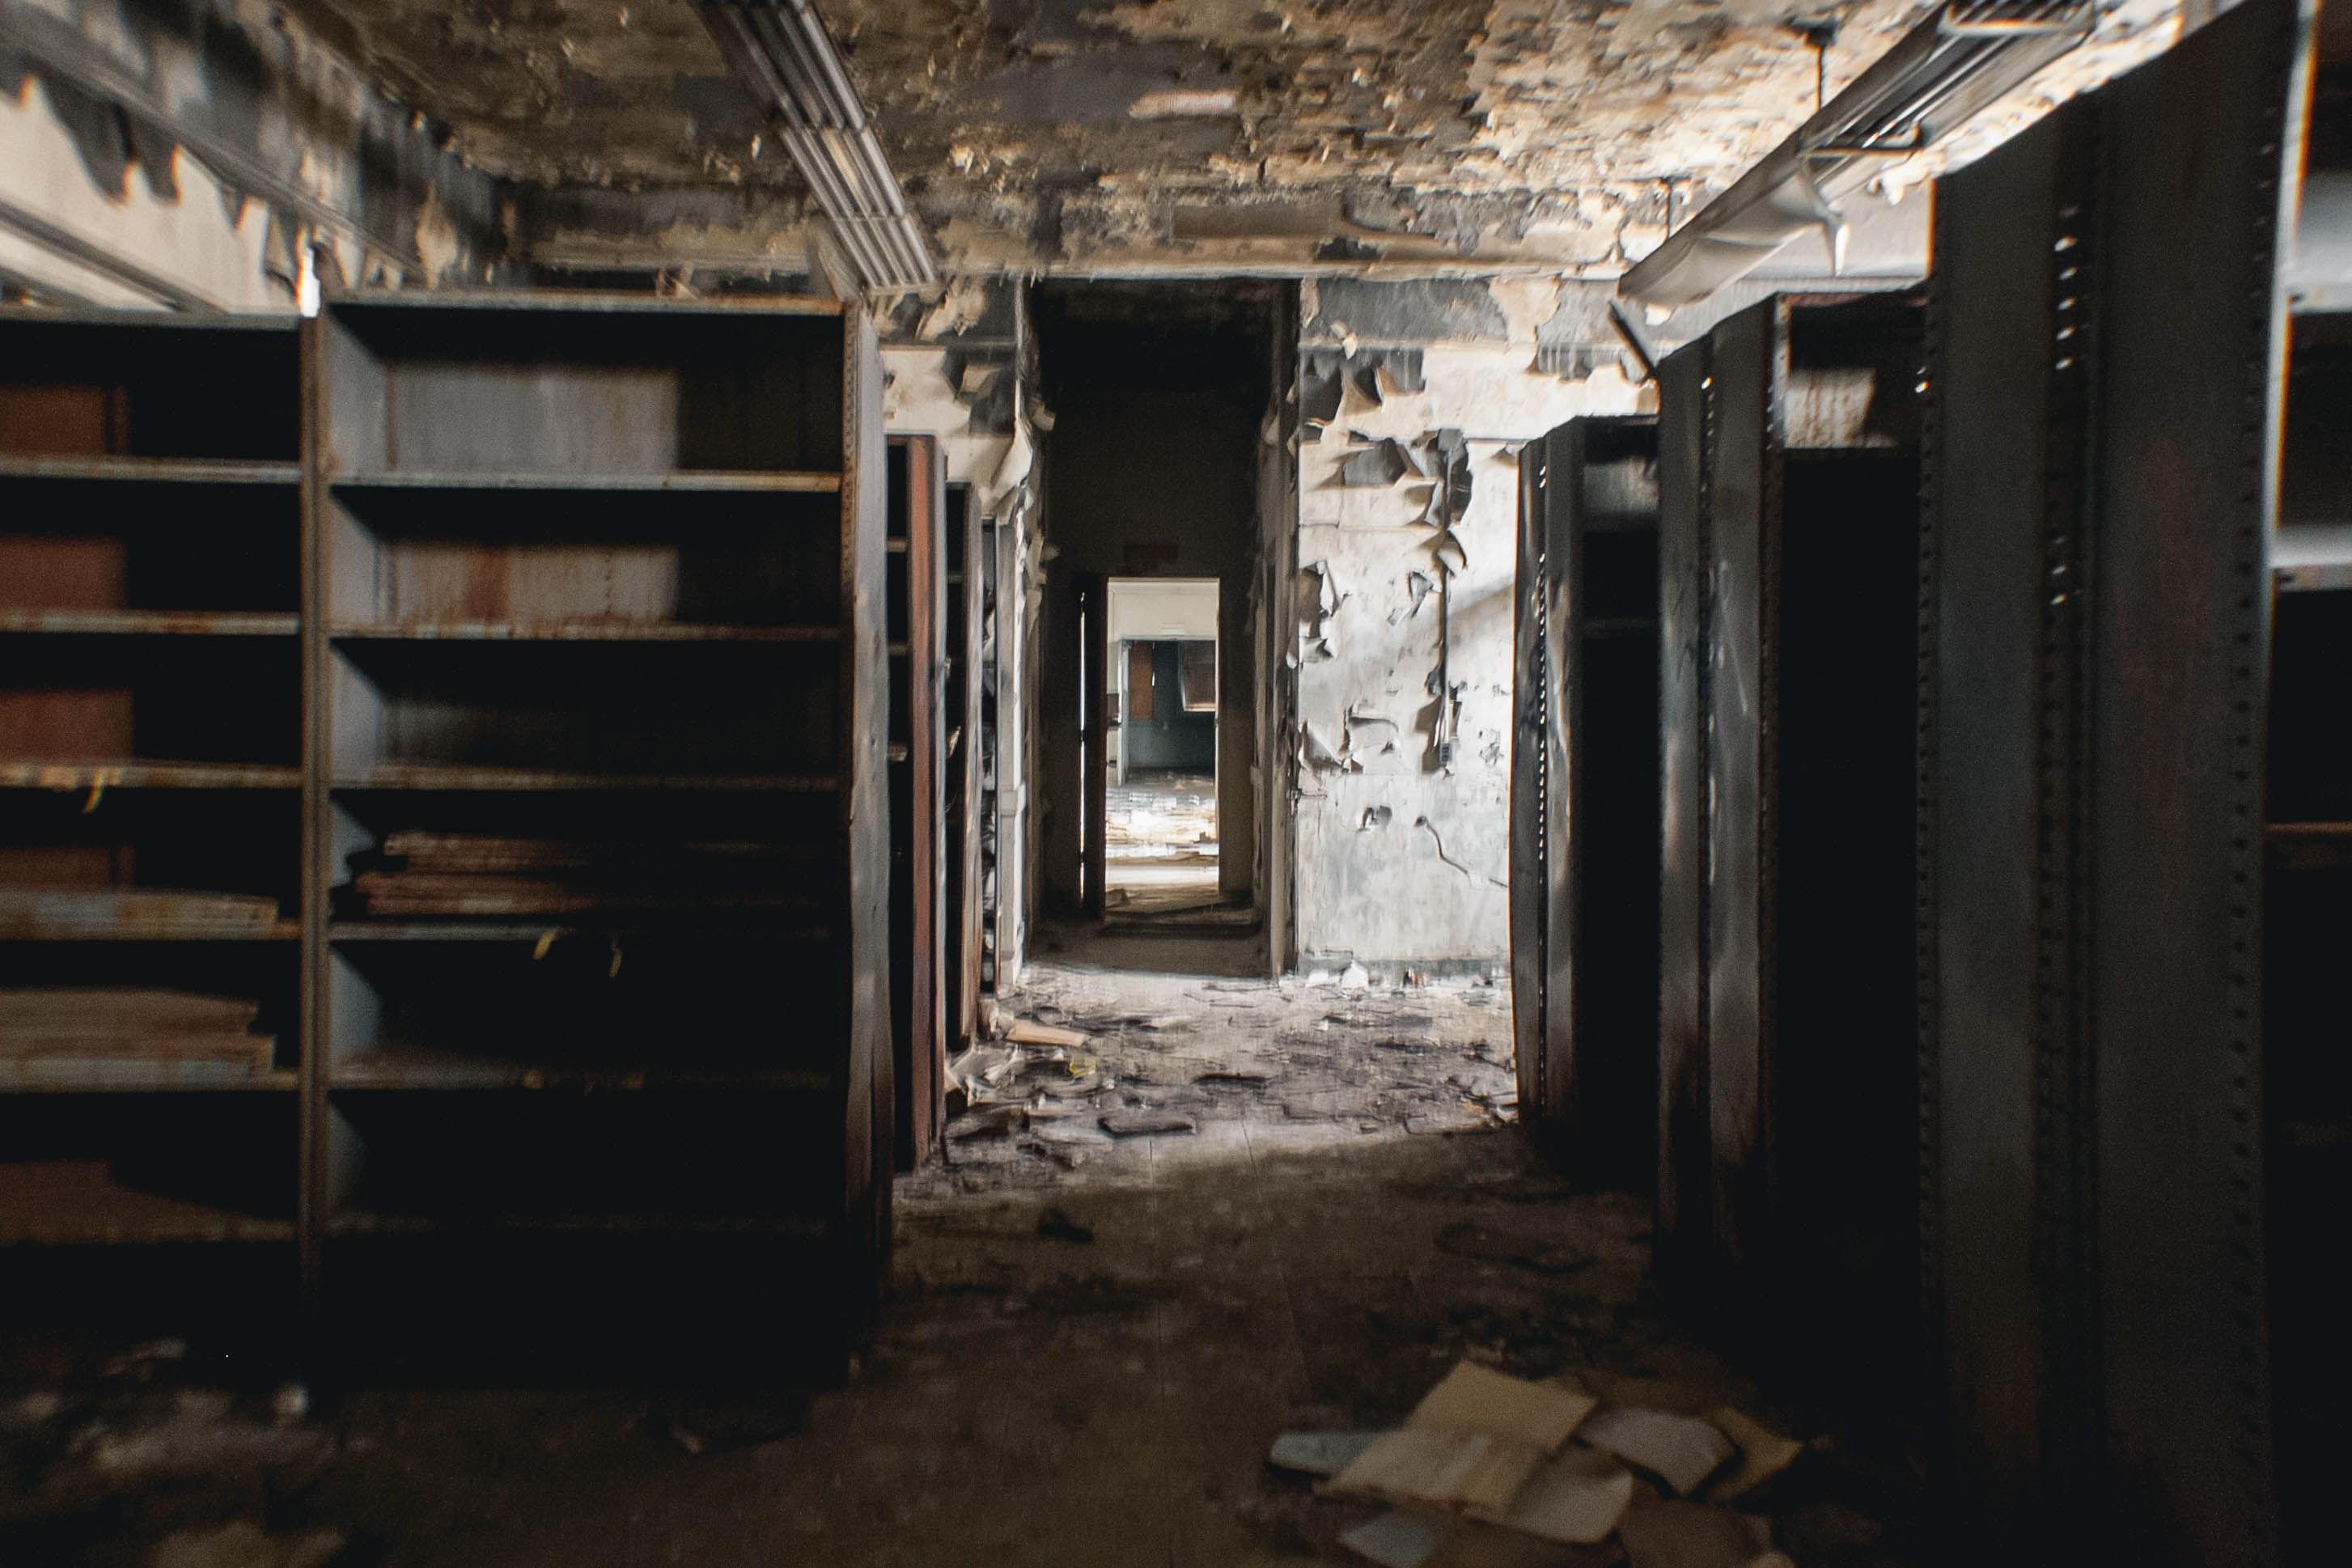 Take a Look Inside Downey's Creepy Abandoned Asylum | Fire damage, Fire,  Find a room